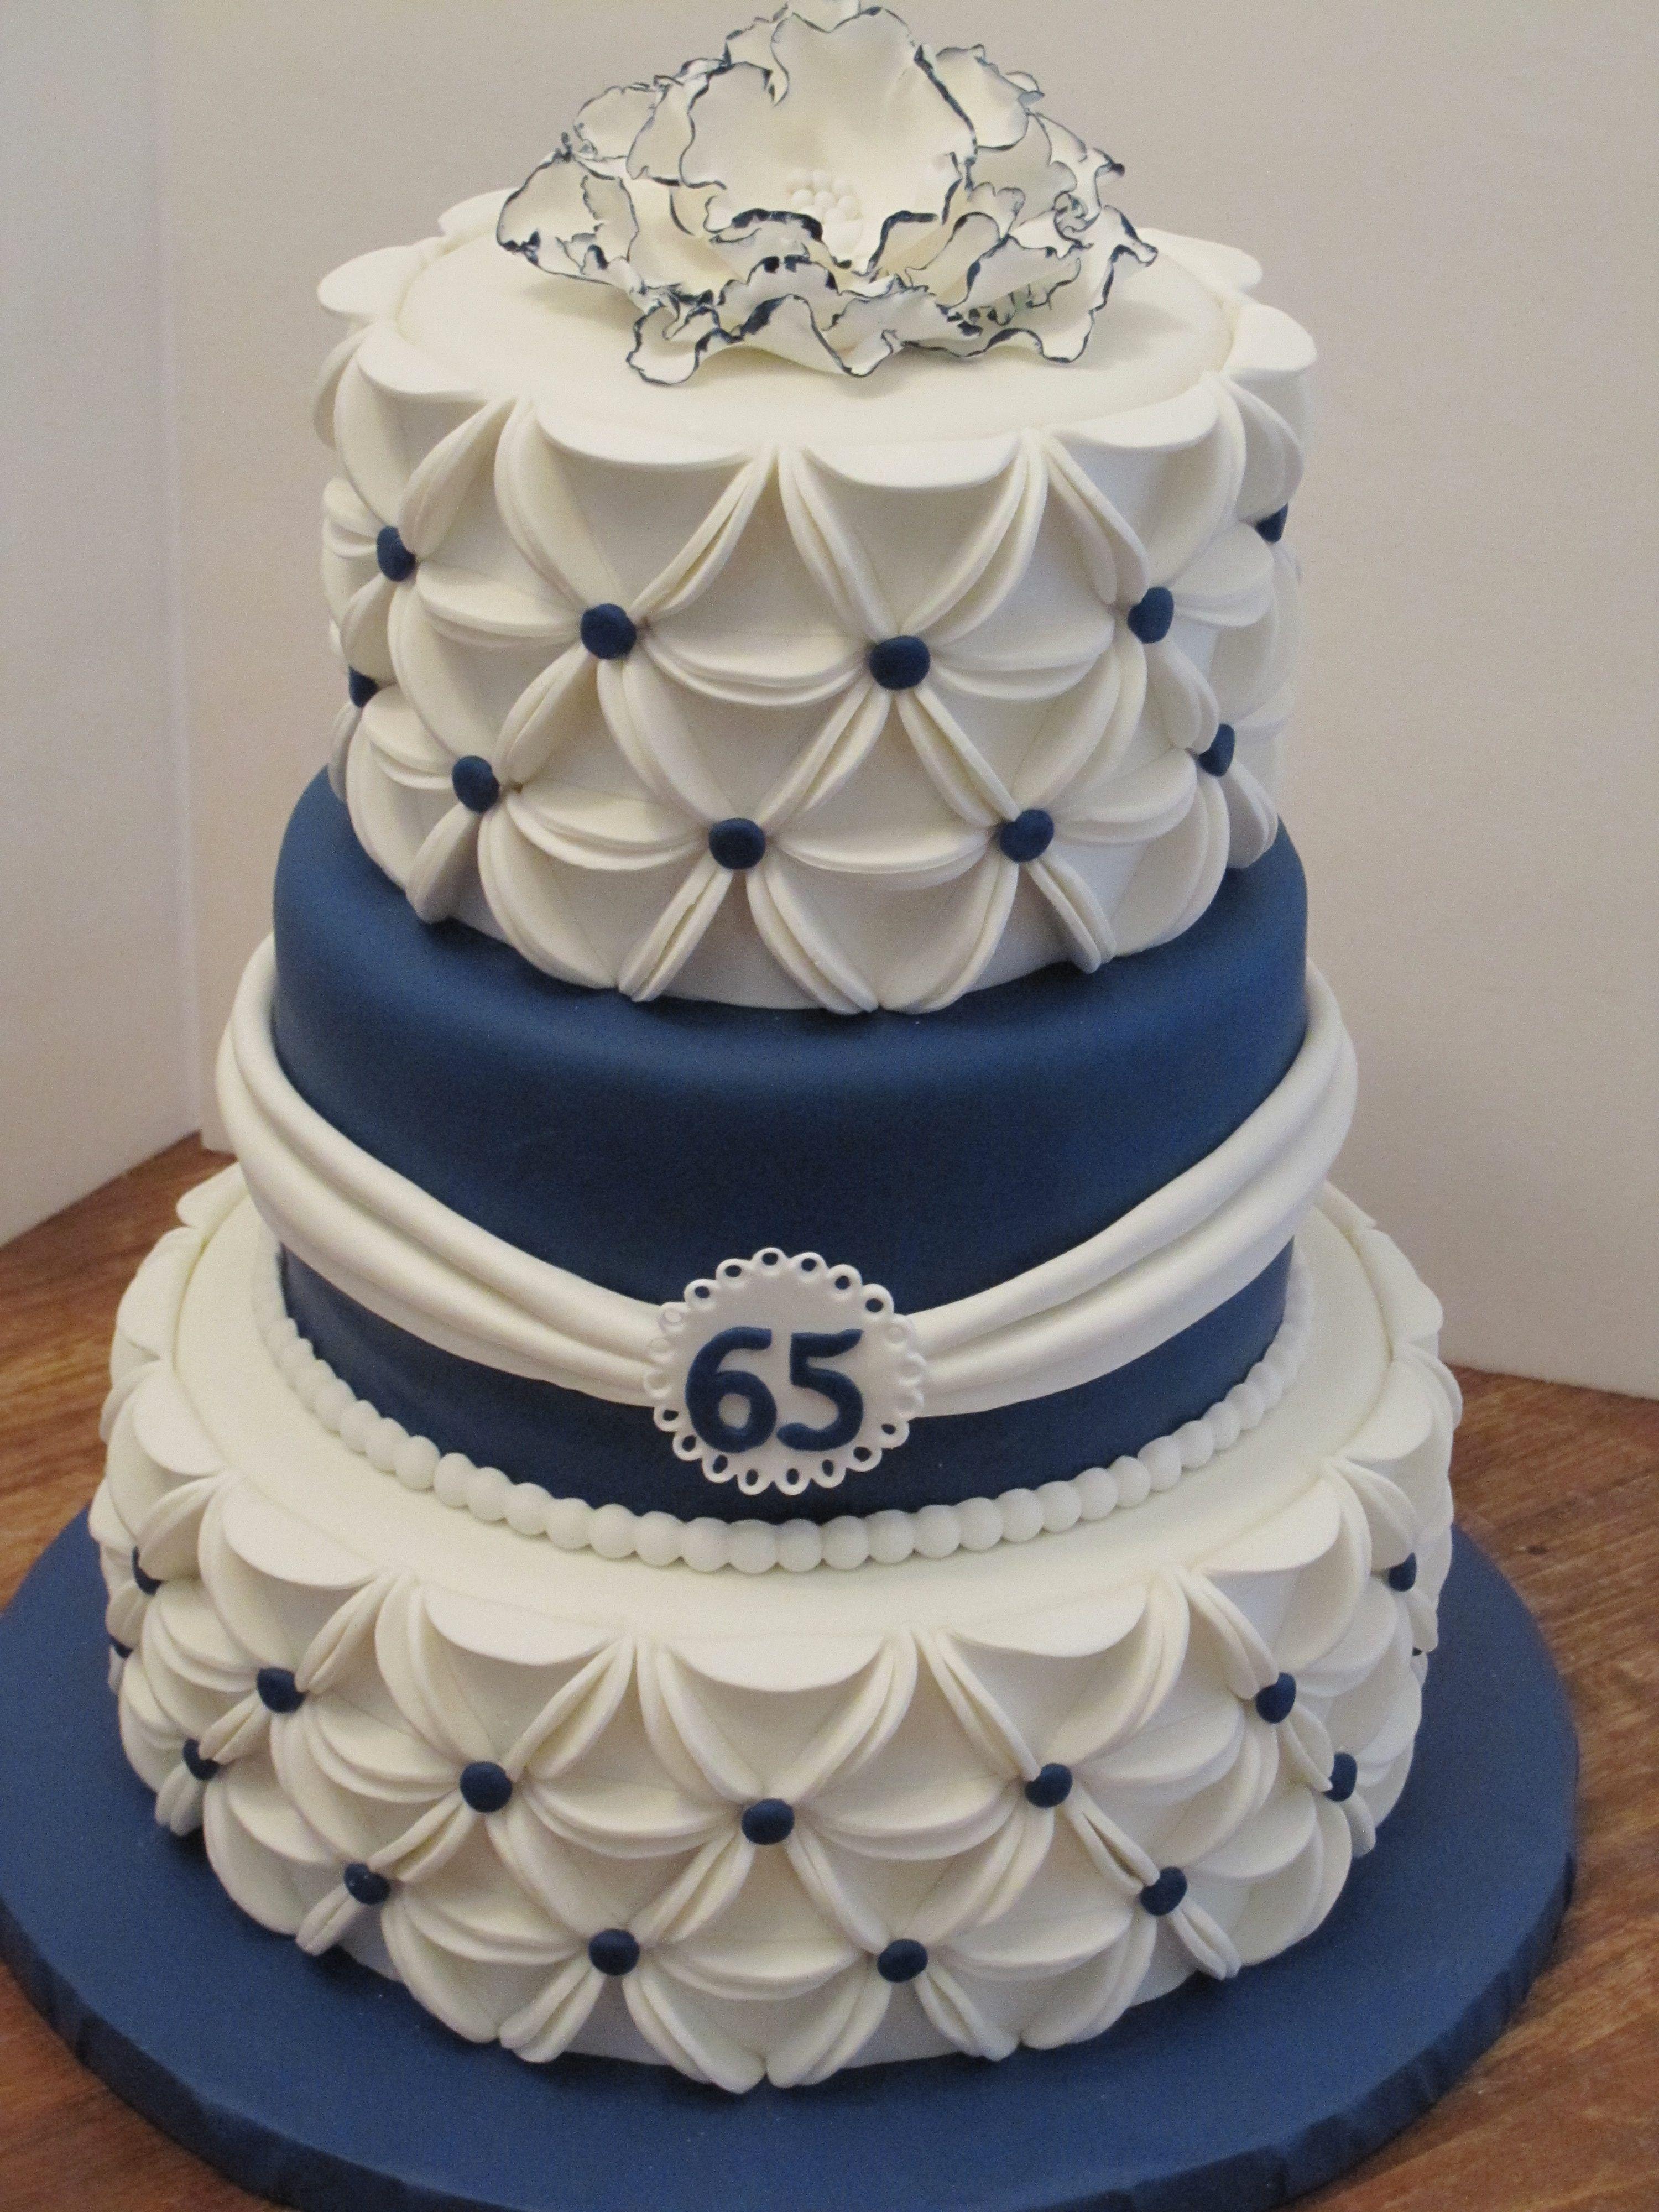 069Jpg Cake